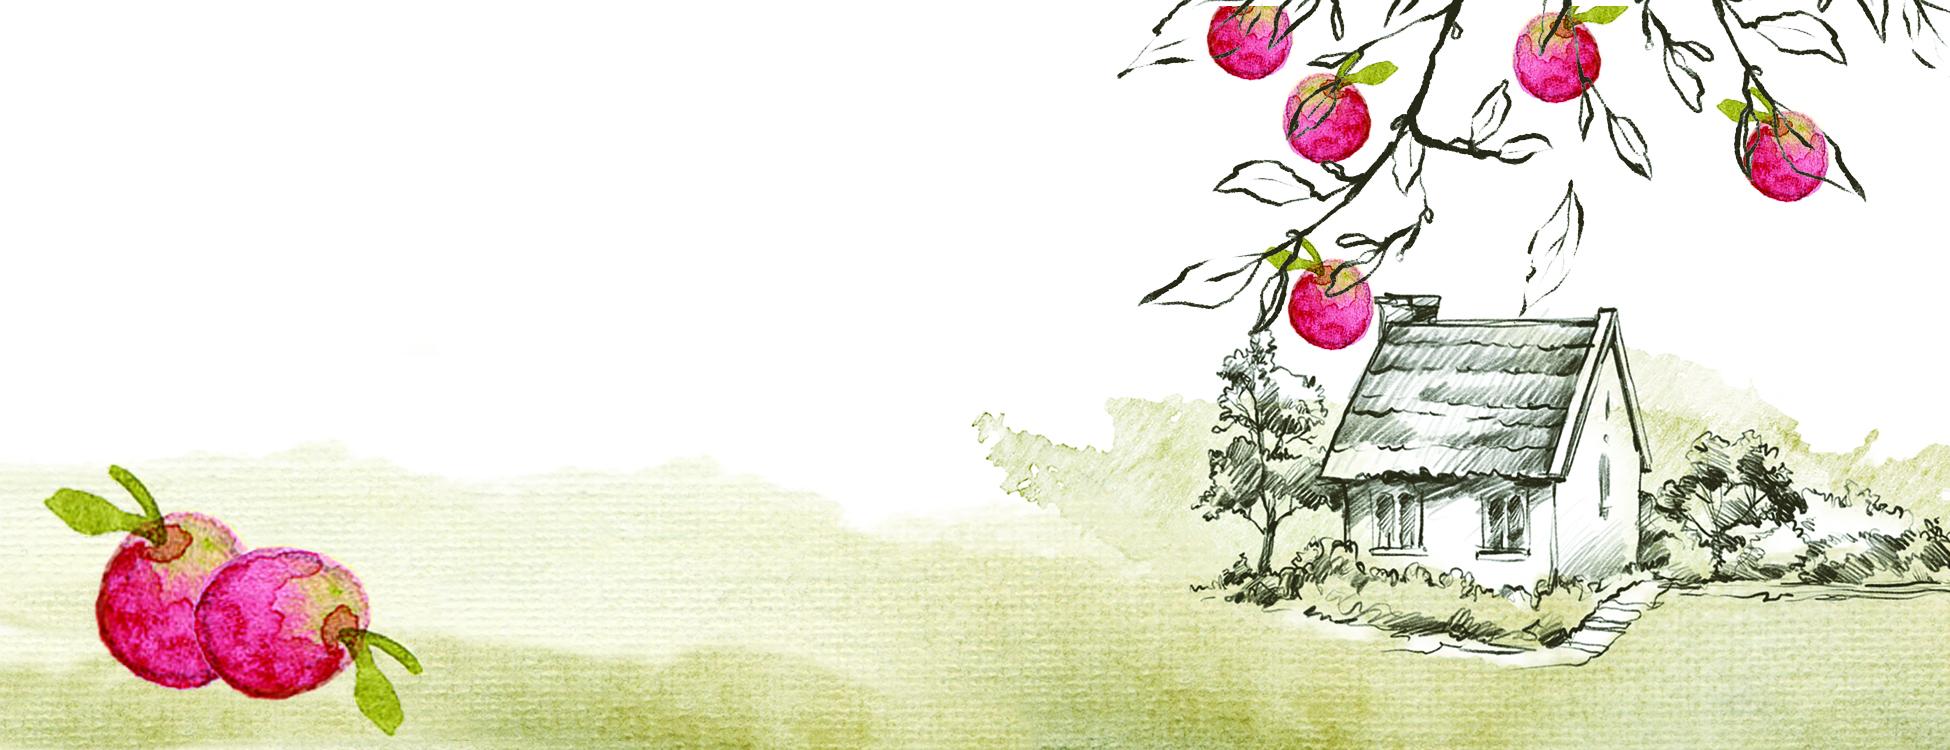 orchard-header.jpg